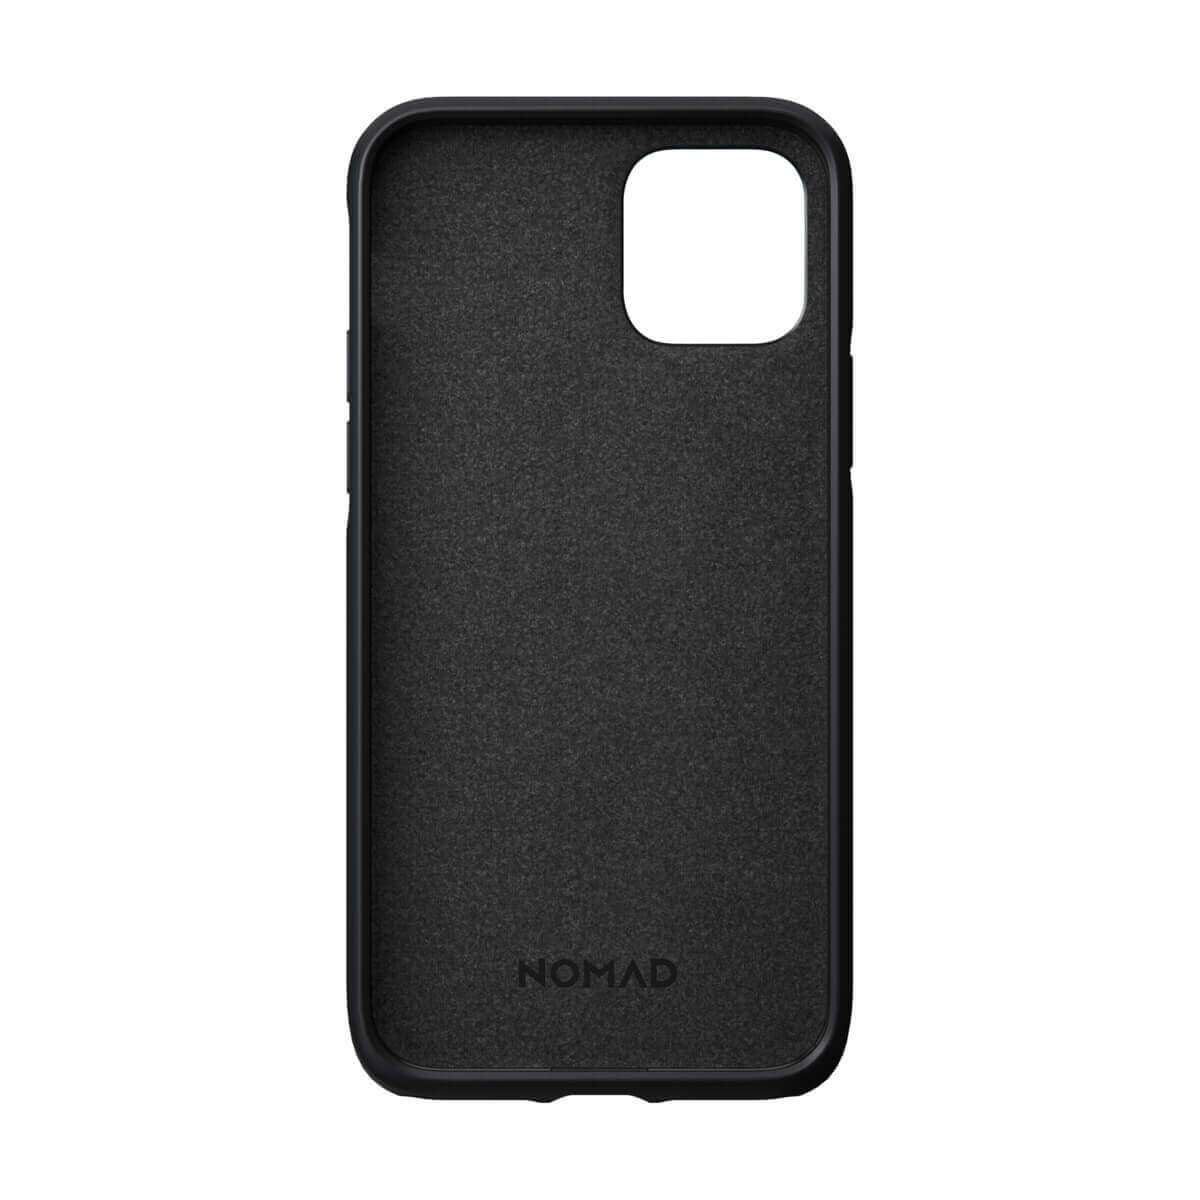 Nomad Leather Rugged Waterproof Case — кожен (естествена кожа) кейс за iPhone 11 Pro Max (кафяв) - 4